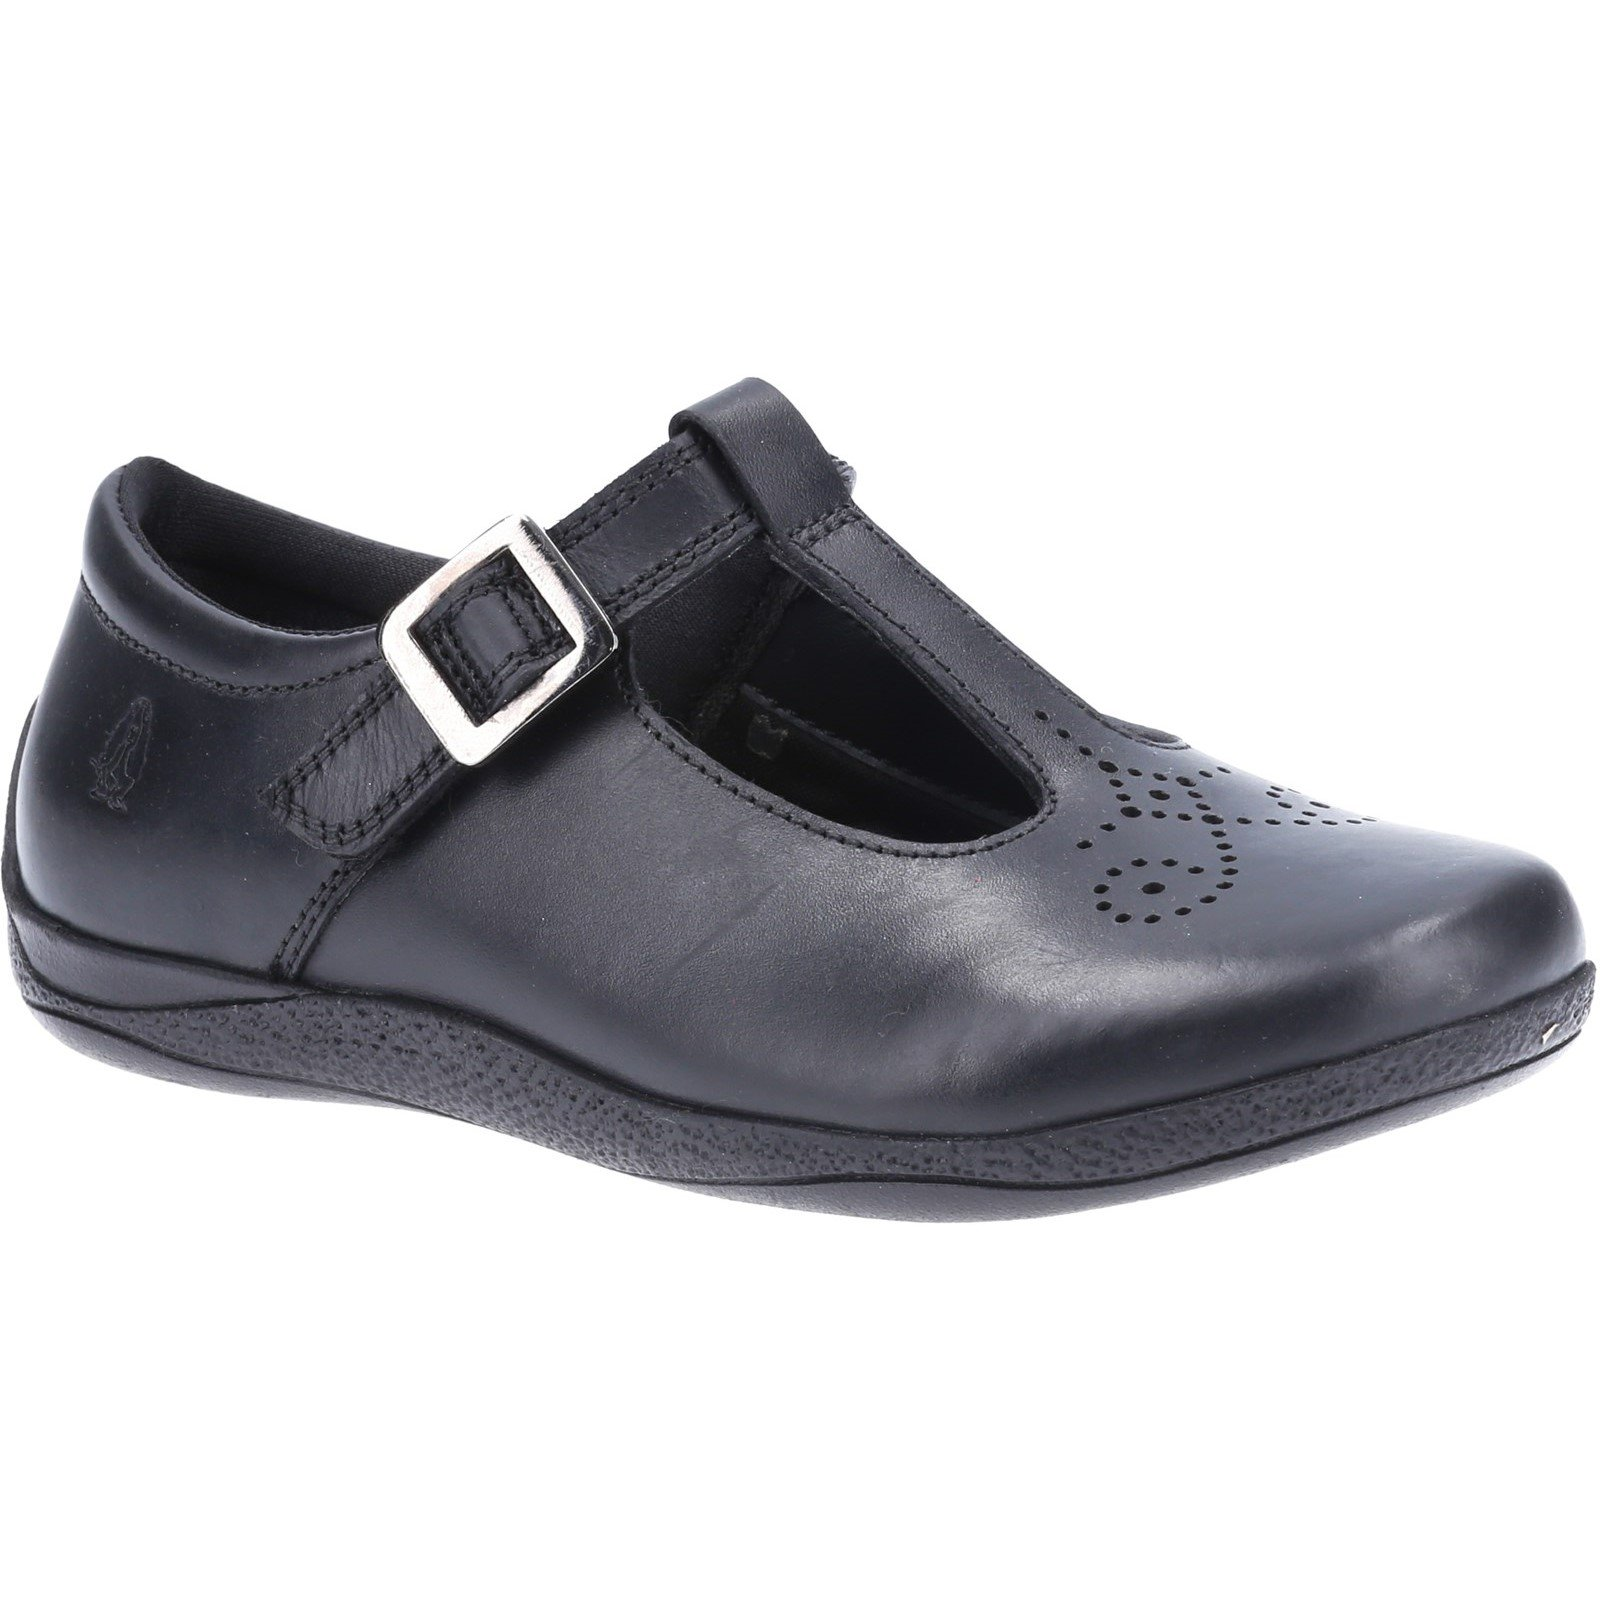 Hush Puppies Kid's Eliza Senior School Shoe Black 32590 - Black 3